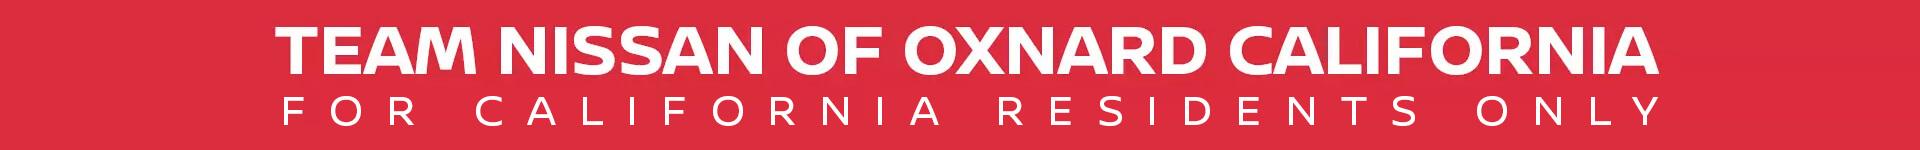 Team Nissan of Oxnard California